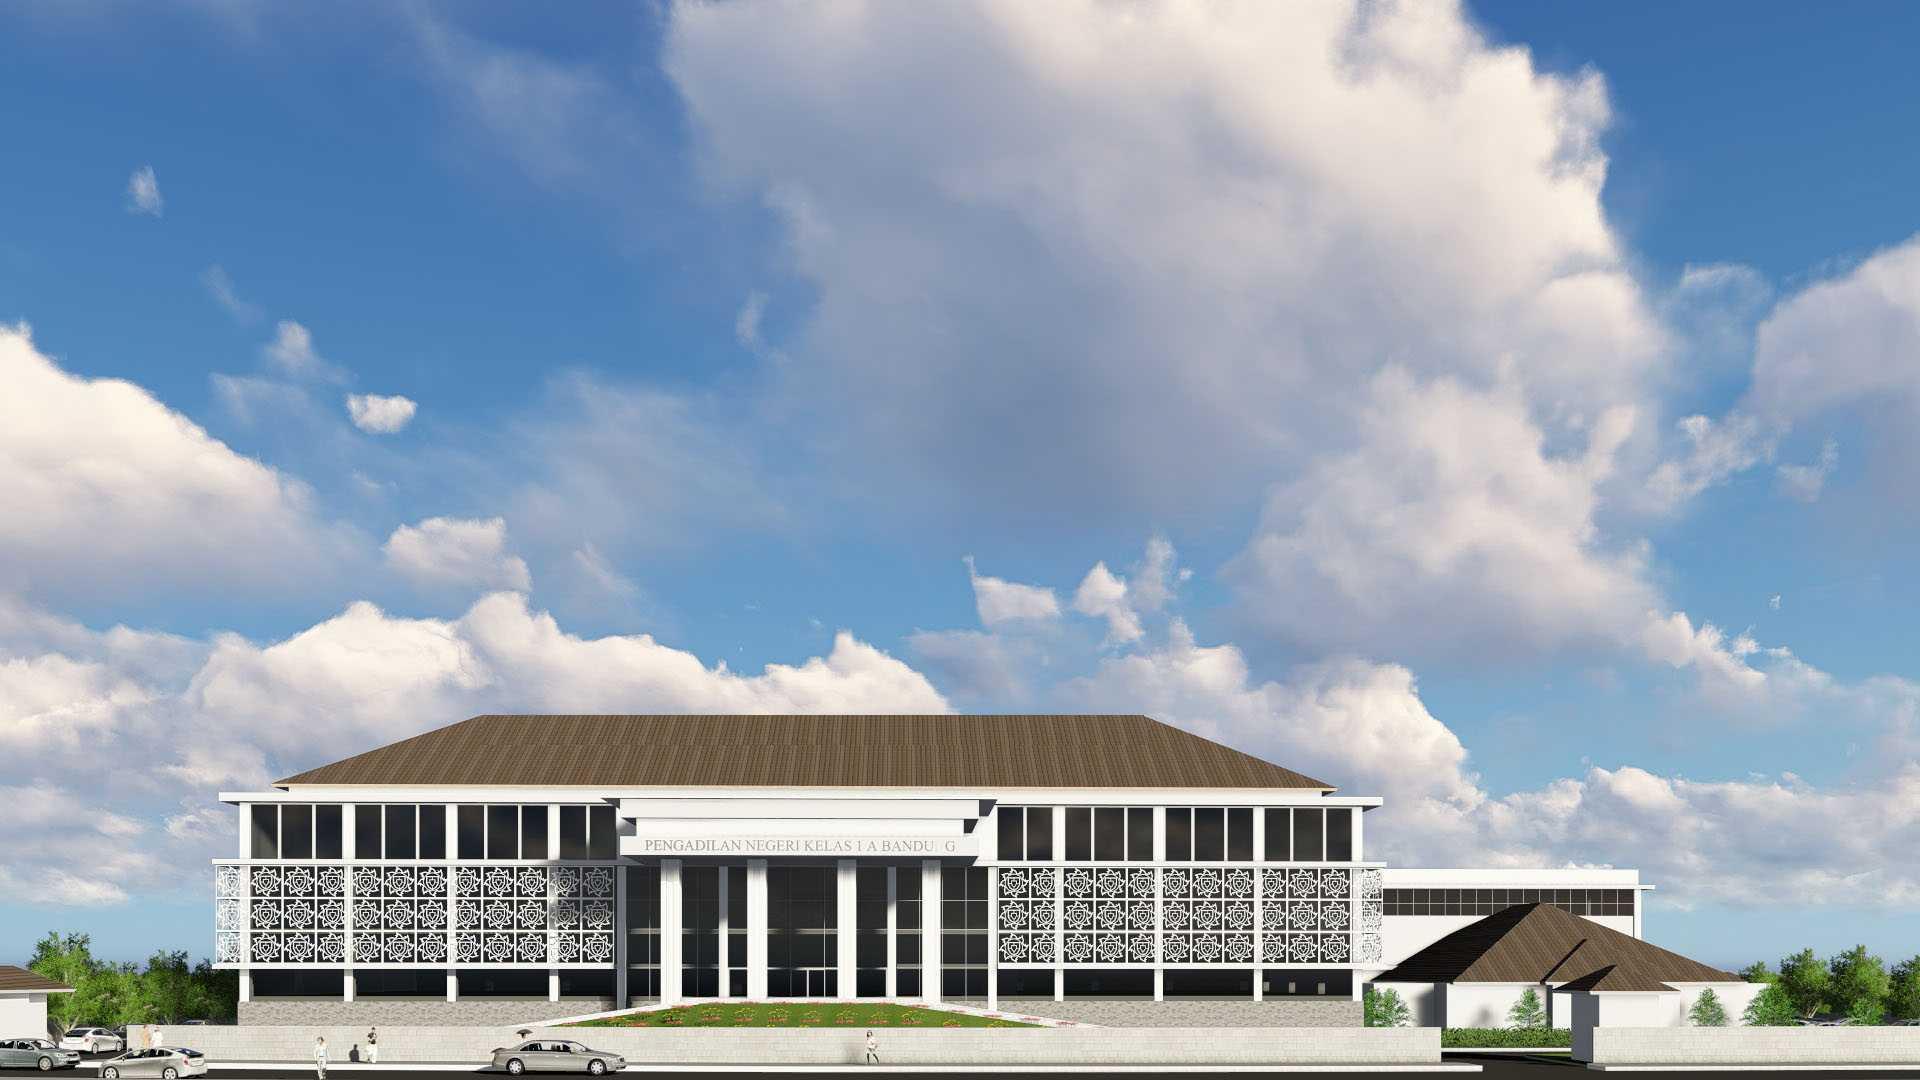 Muhammad Imaaduddin  Pengadilan Kelas 1A Bandung Bandung, Kota Bandung, Jawa Barat, Indonesia Bandung, Kota Bandung, Jawa Barat, Indonesia Muhammad-Imaaduddin-Pengadilan-Kelas-1A-Bandung   61960